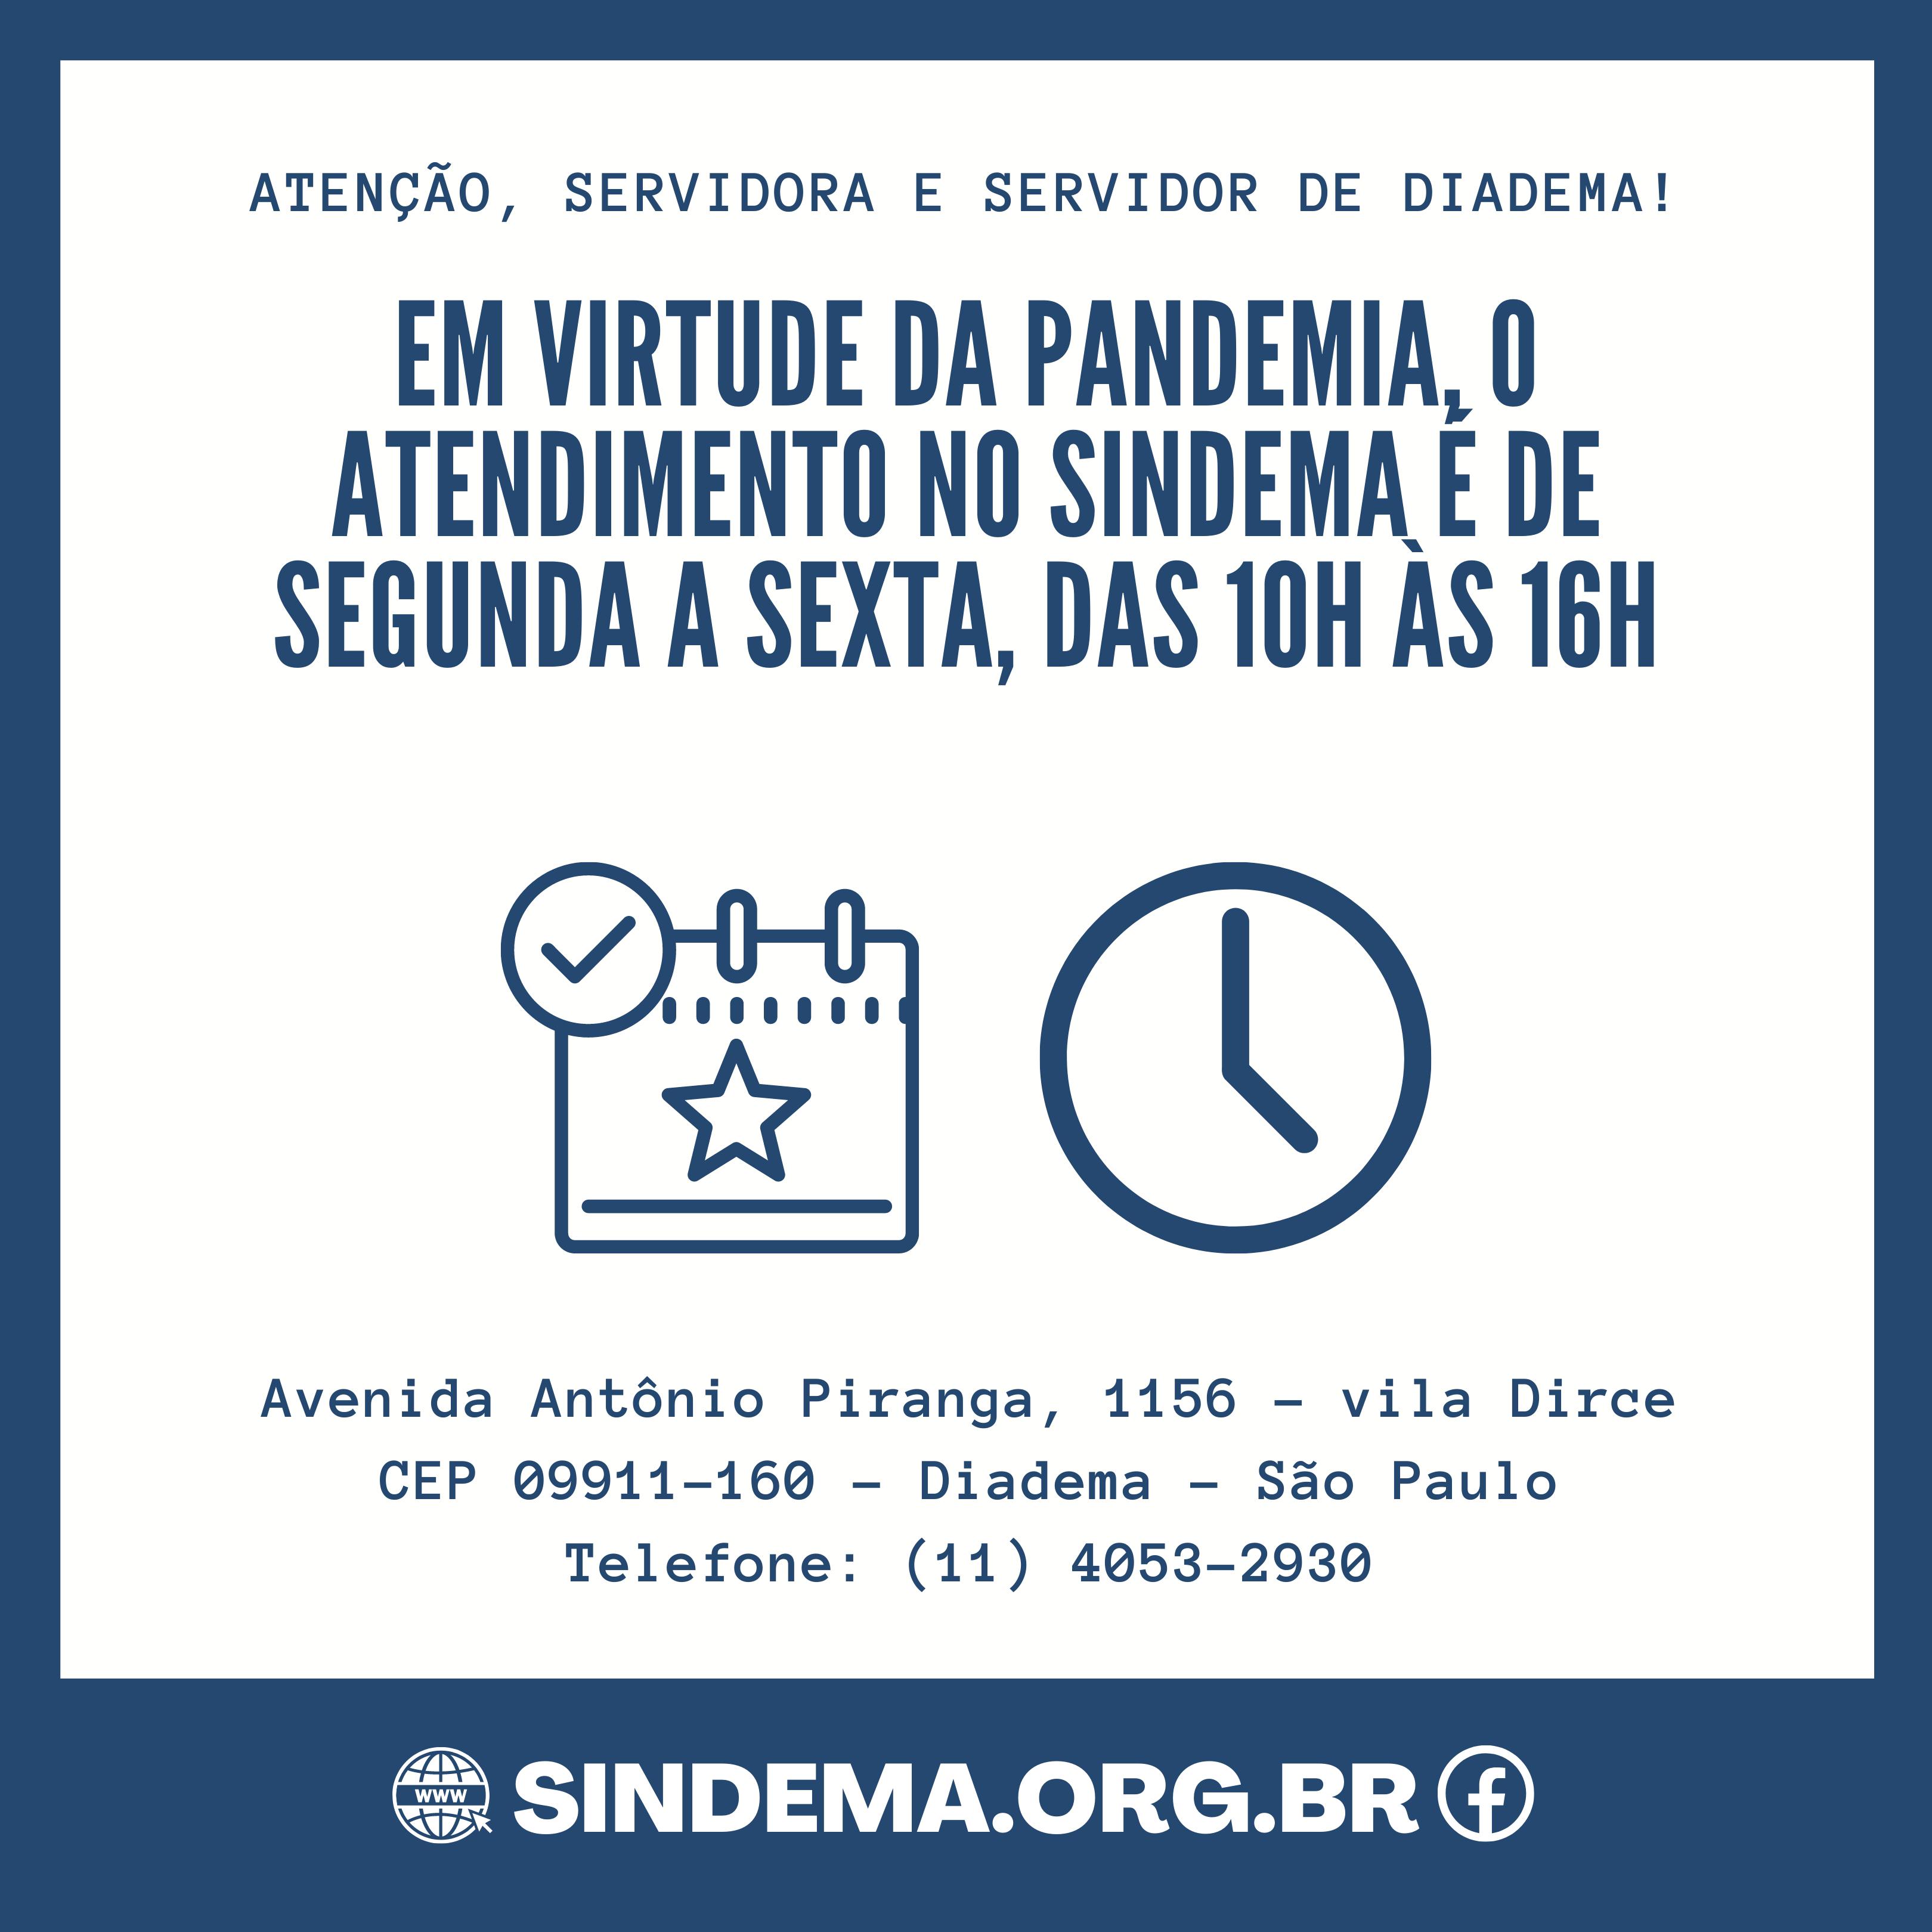 Funcionamento do Sindema.